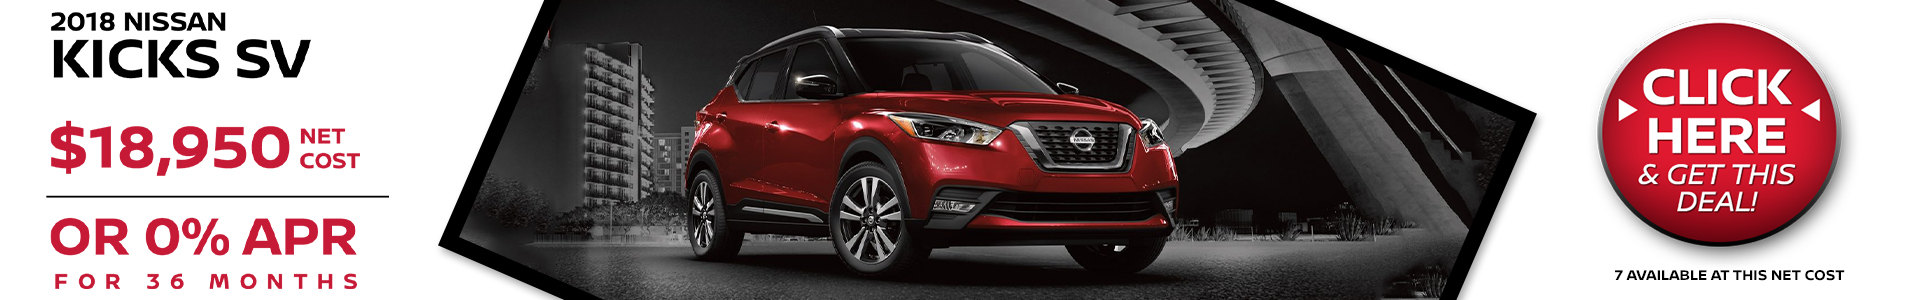 Mossy Nissan - Nissan Kicks $18,950 Purchsae